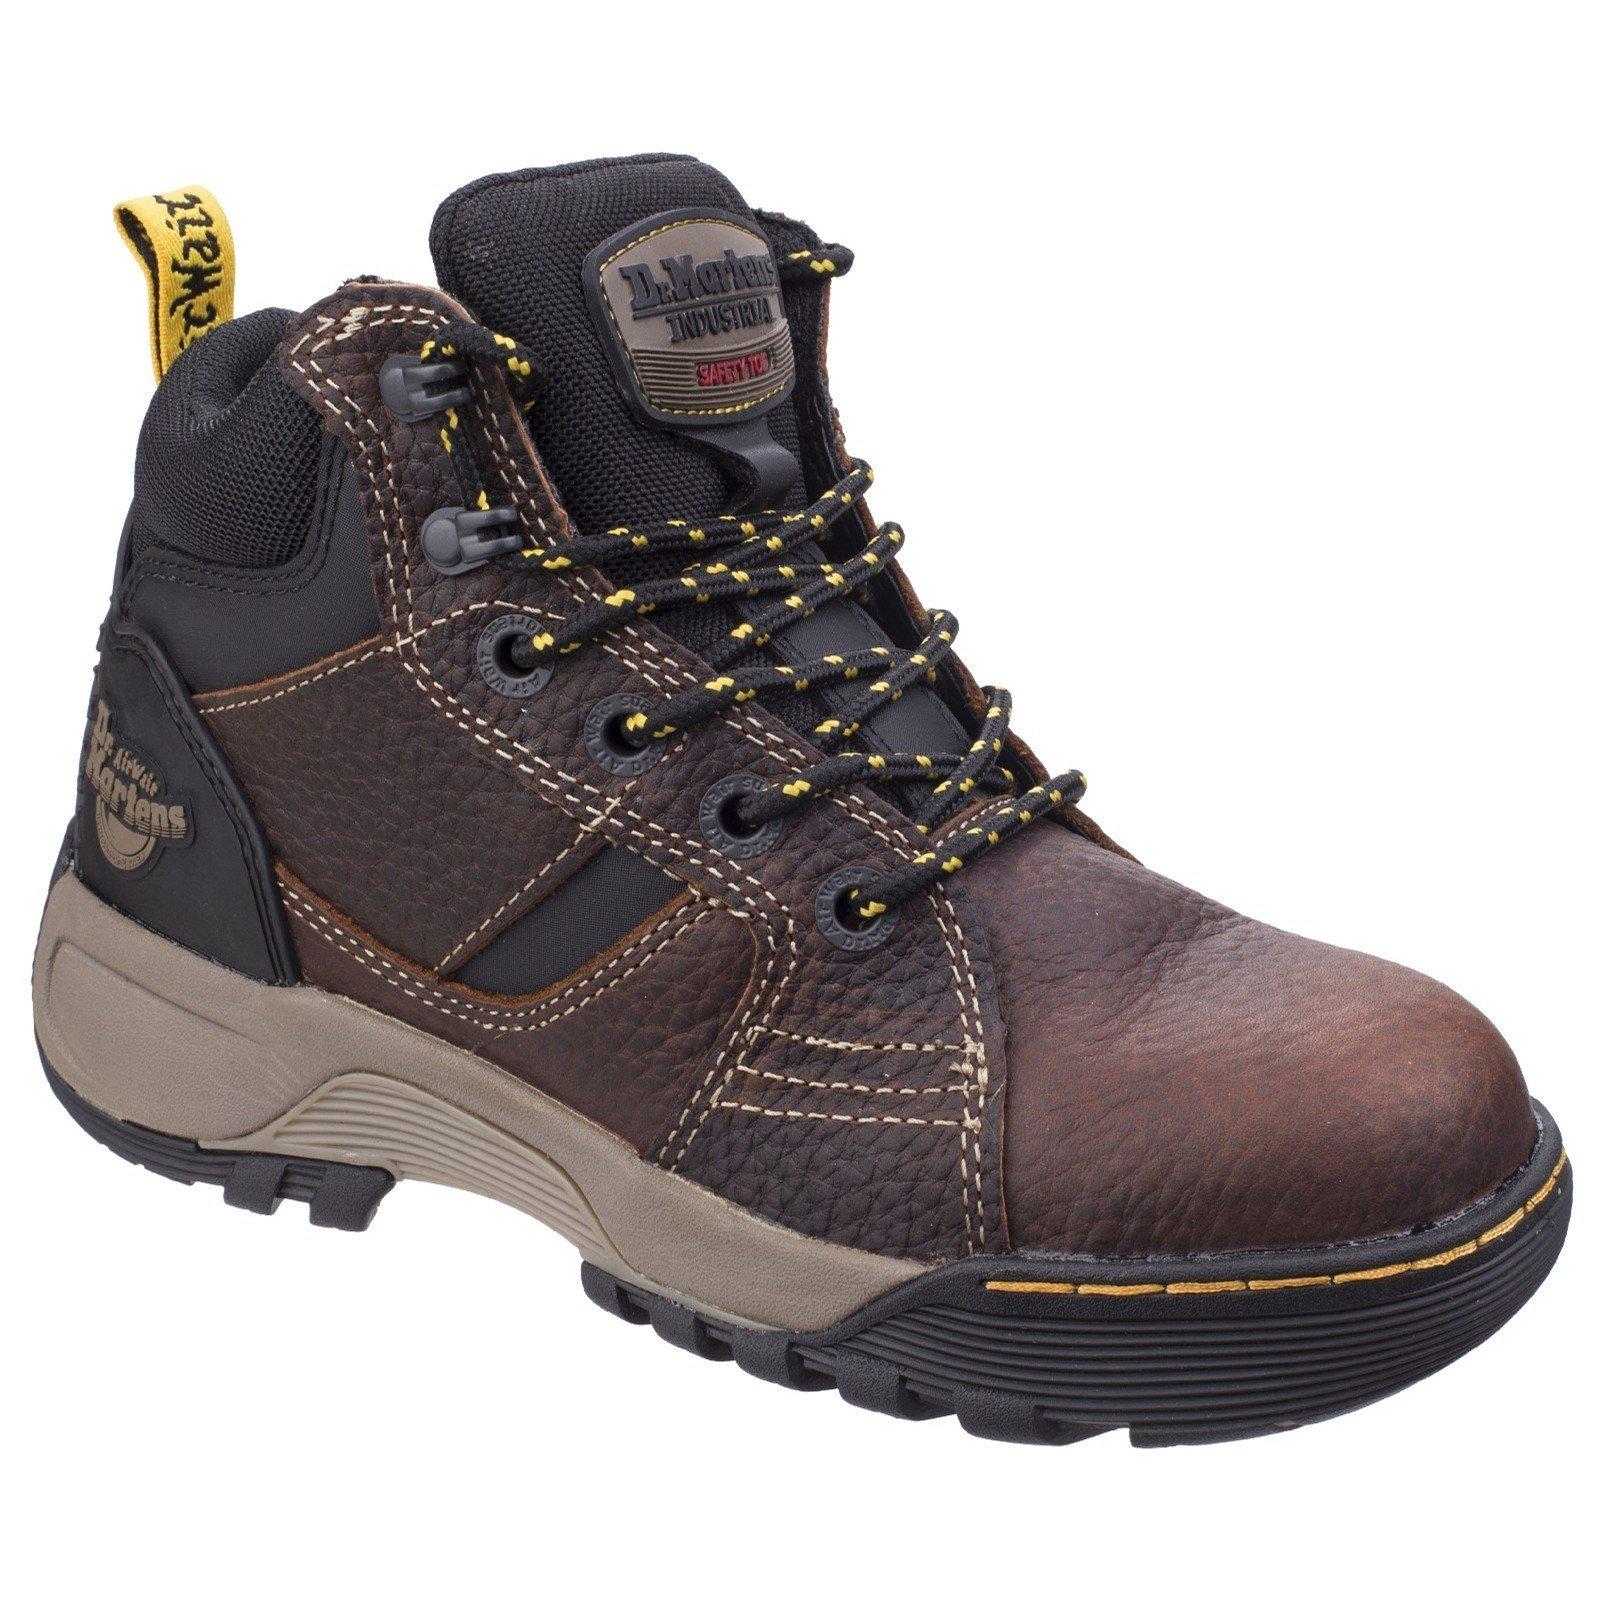 Dr Martens Men's Grapple Safety Boot Various Colours 26023 - Teak 8